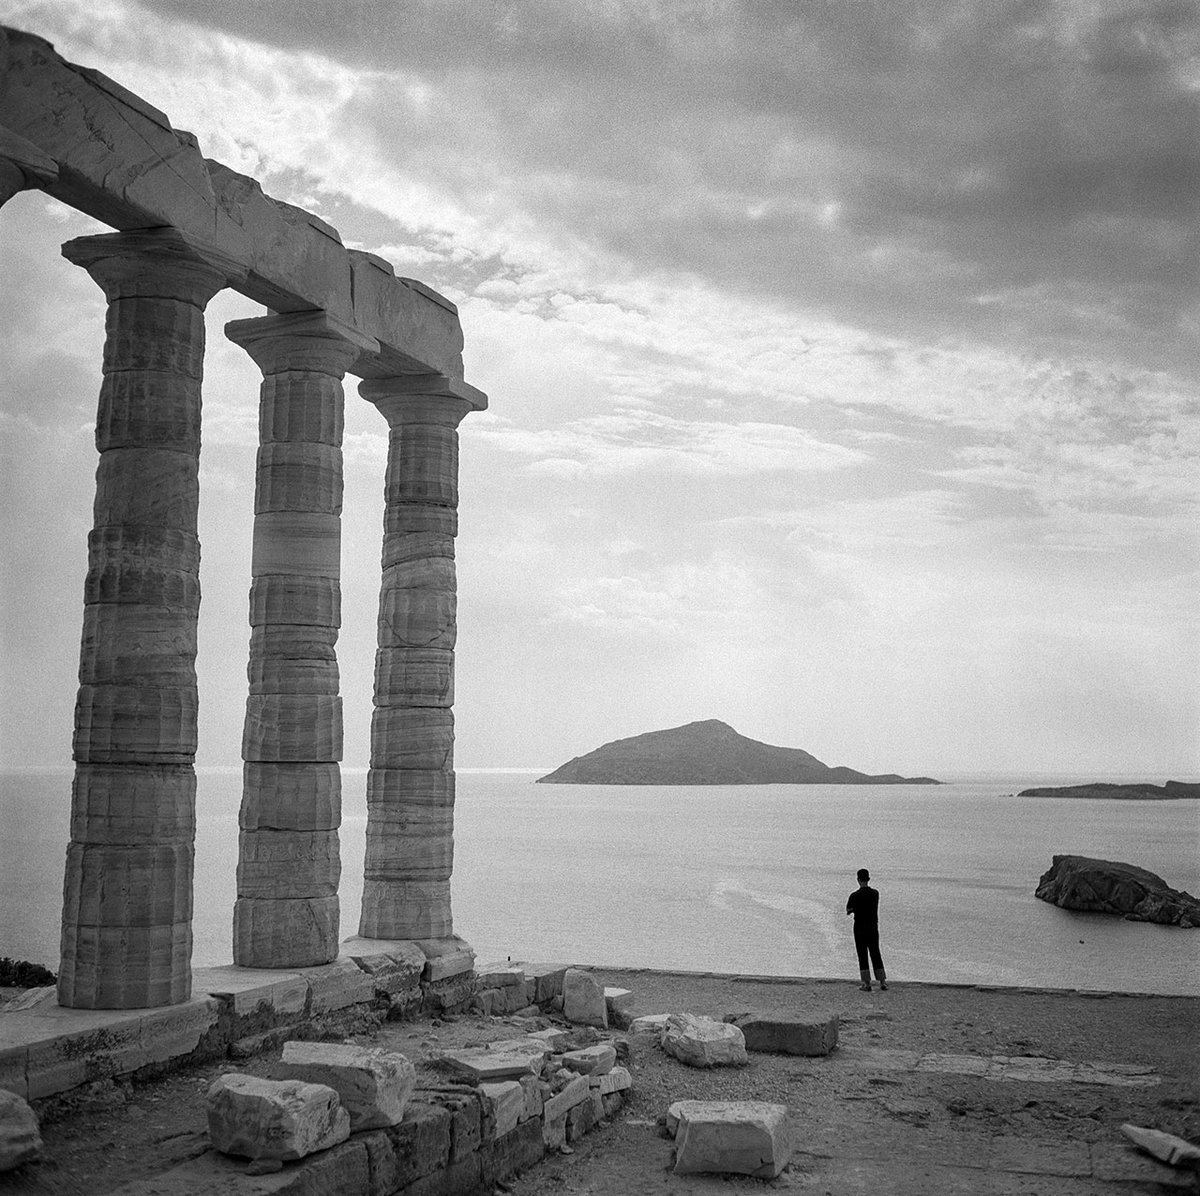 Photo © Robert McCabe Sounion 1955 - #photography  rt @ElSnail @MaraRiv2  @AgrapidiL @Jopolkadot  https://t.co/NUkHWl7qCT